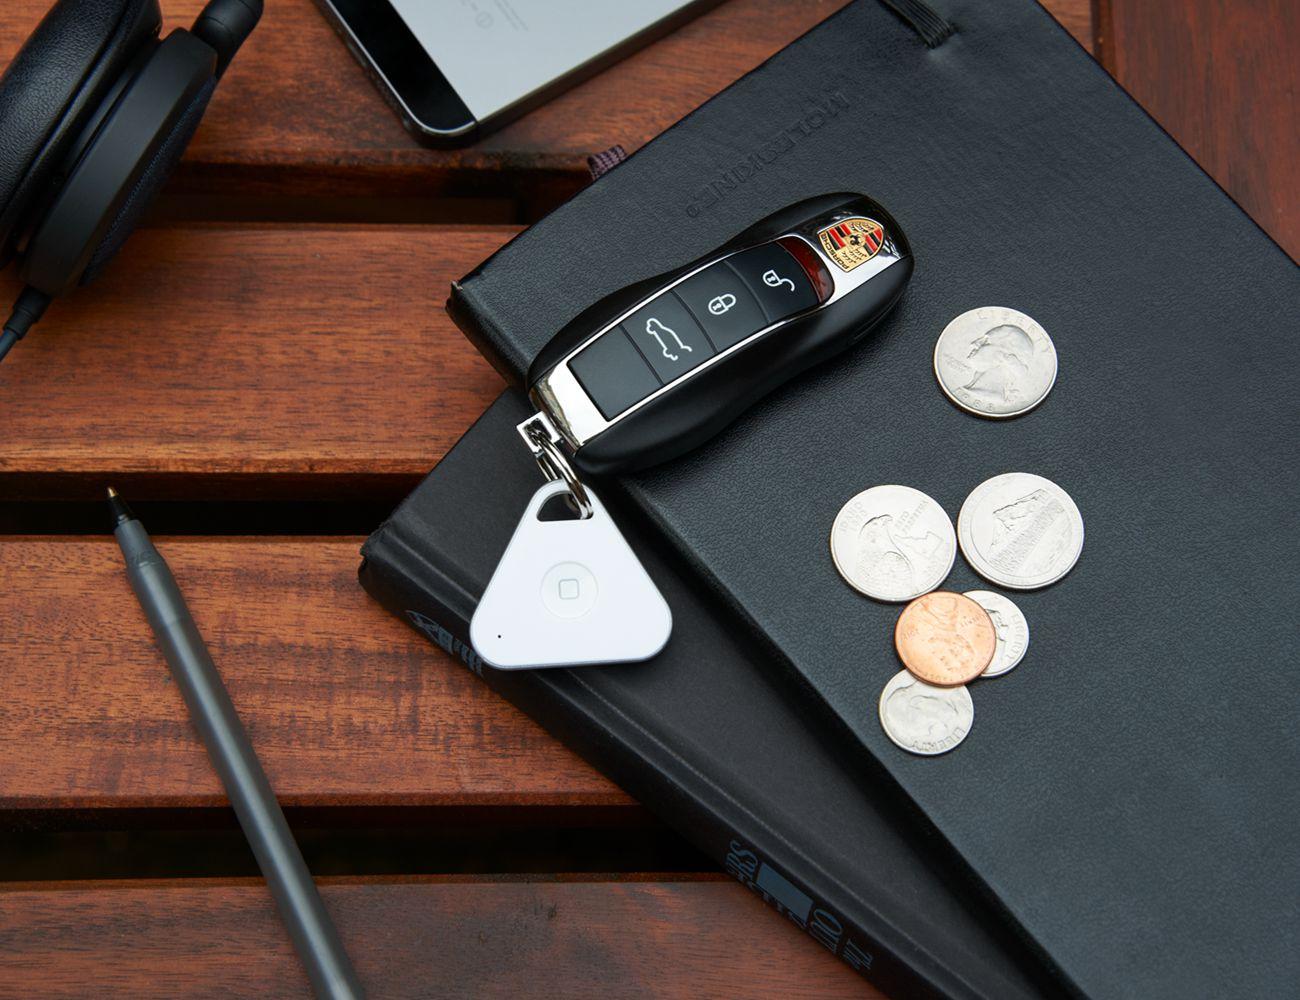 iHere Key Finder and Selfie Remote